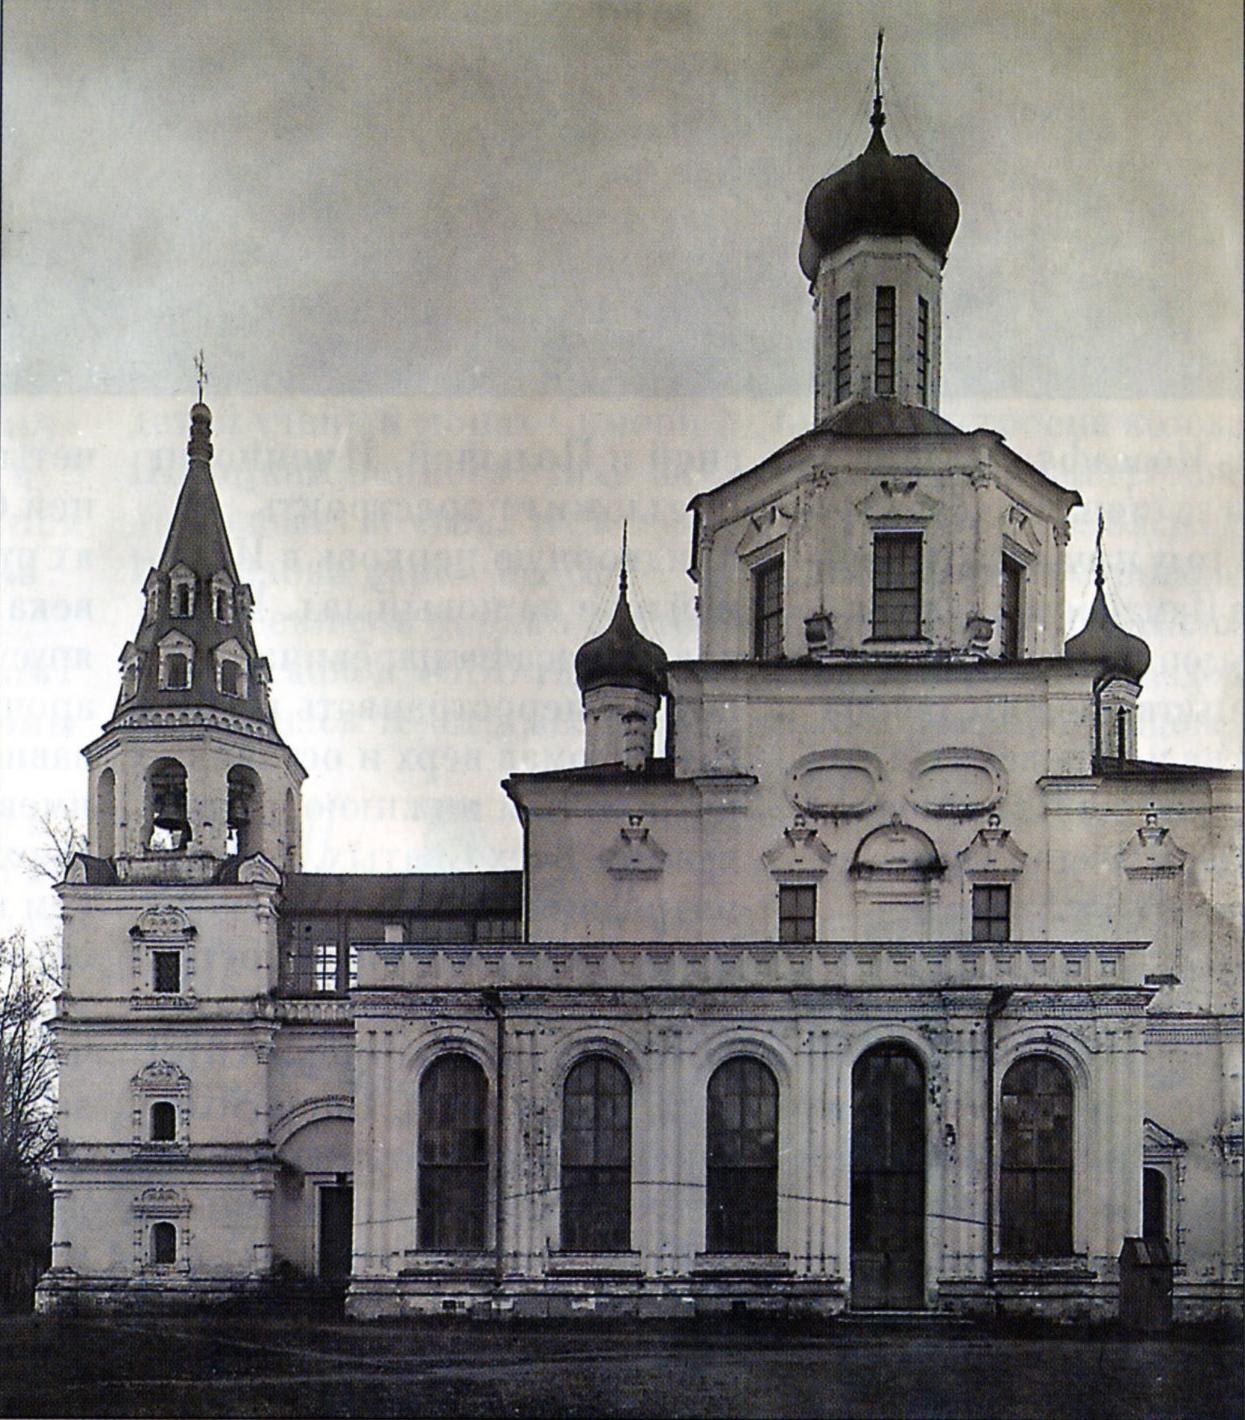 Файл:Церковь царевича Иоасафа в Измайлове.jpg